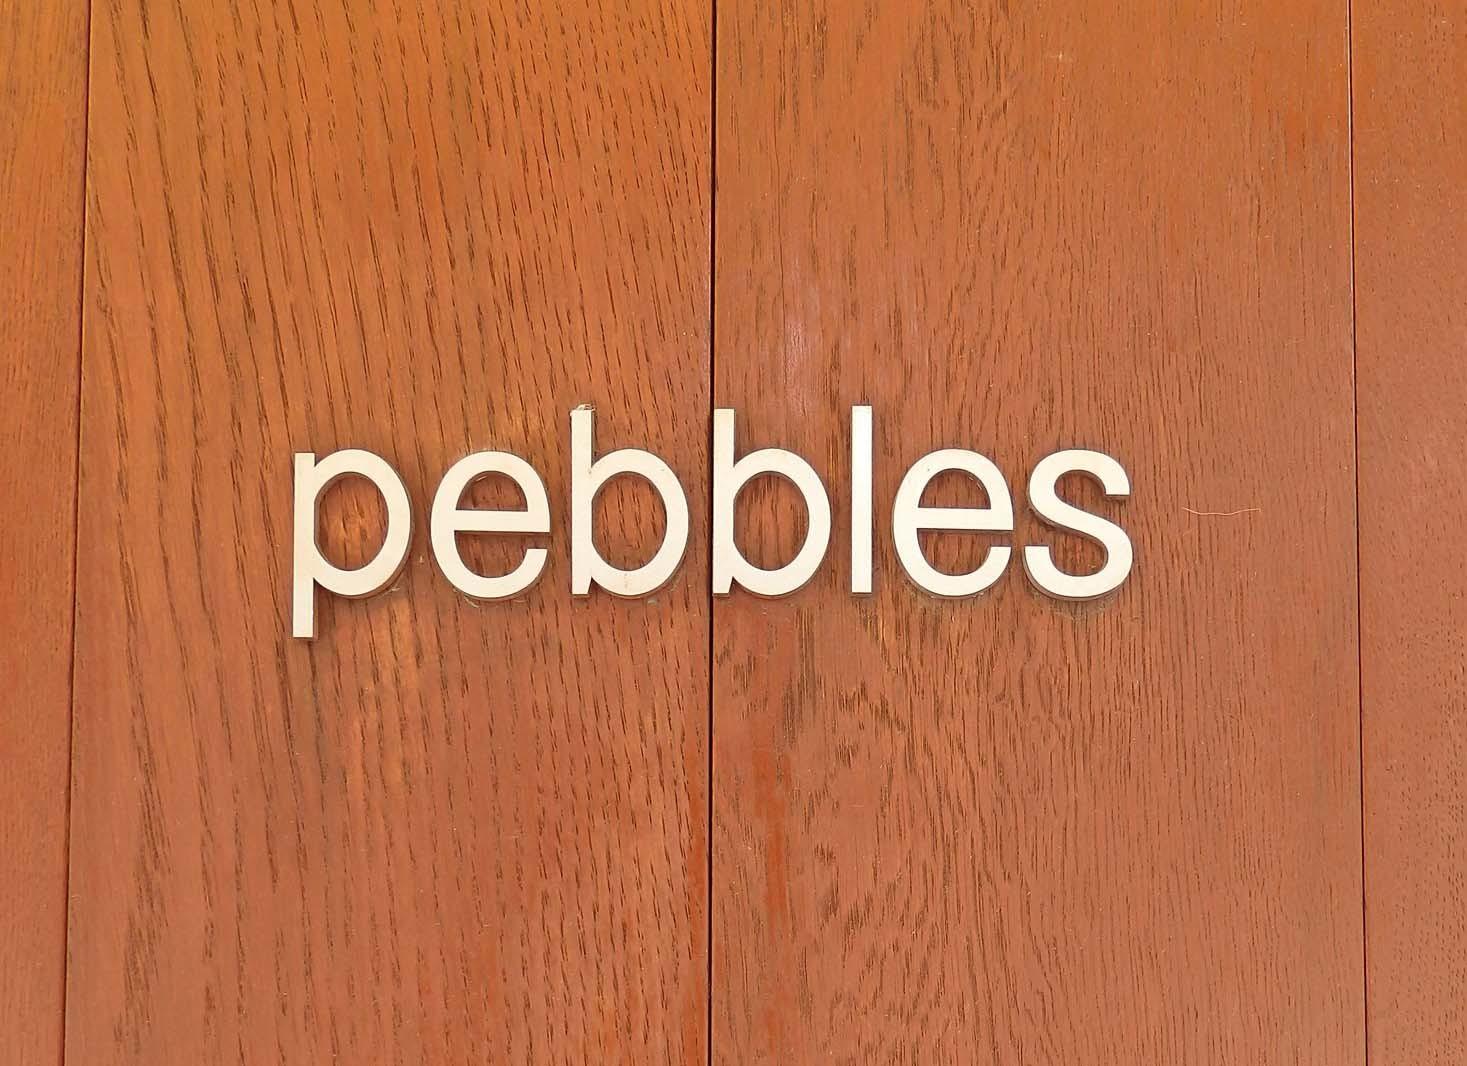 pebbles | 福岡市中央区大名1丁目9番27号第一西部ビル101号